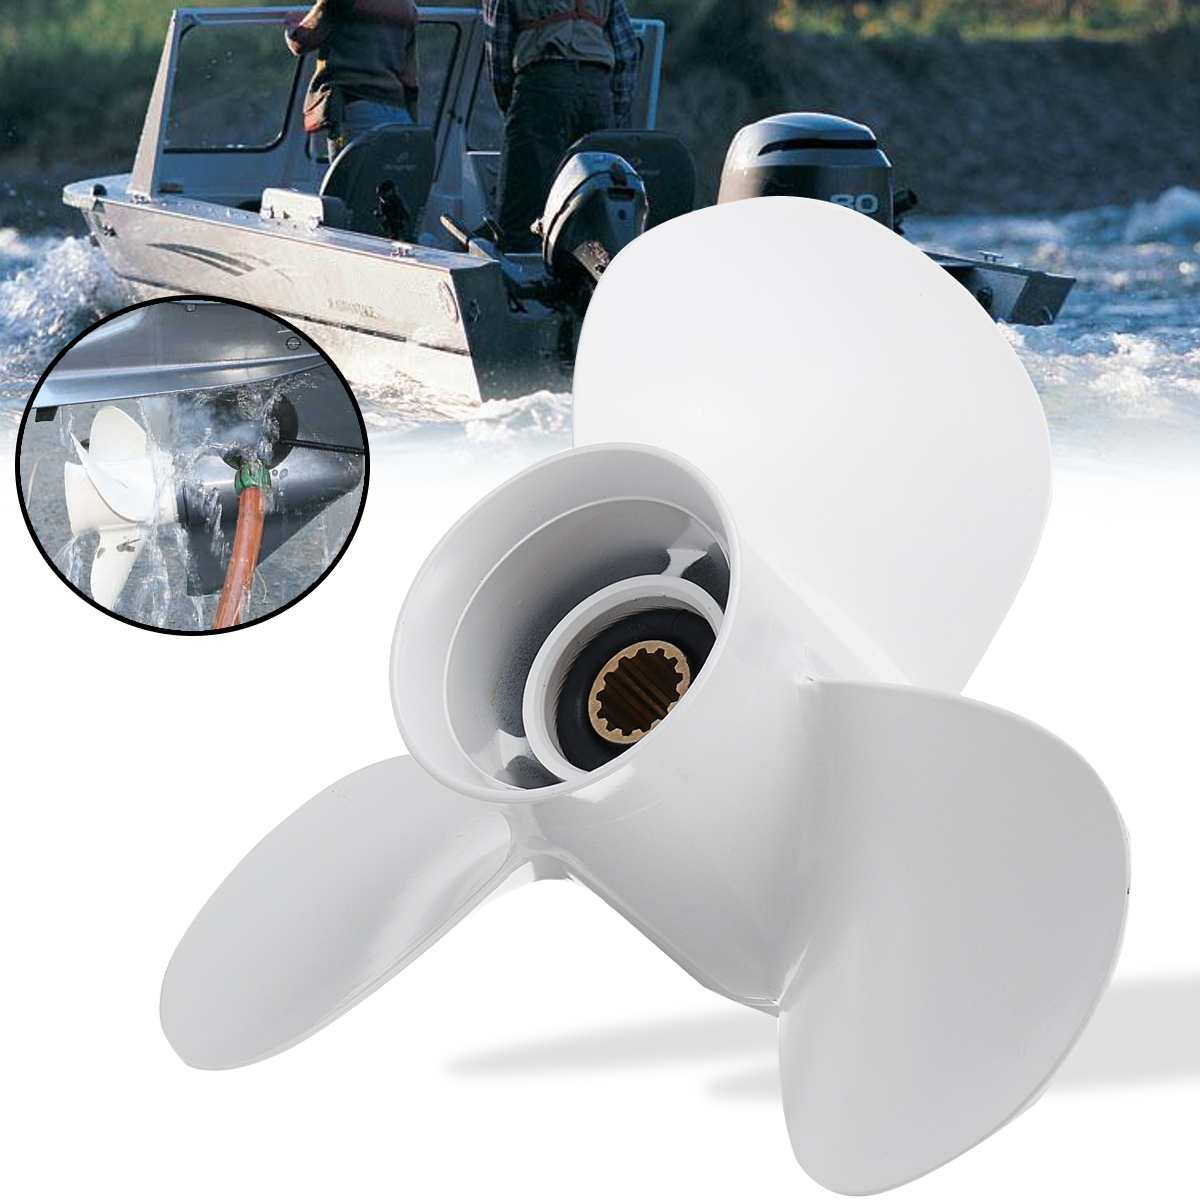 Audew 11 1/4 X 14 Boat Outboard Propeller For Yamaha 25-60HP 663-45958-01-EL Marine Propeller 13 Spline Tooth White Aluminum